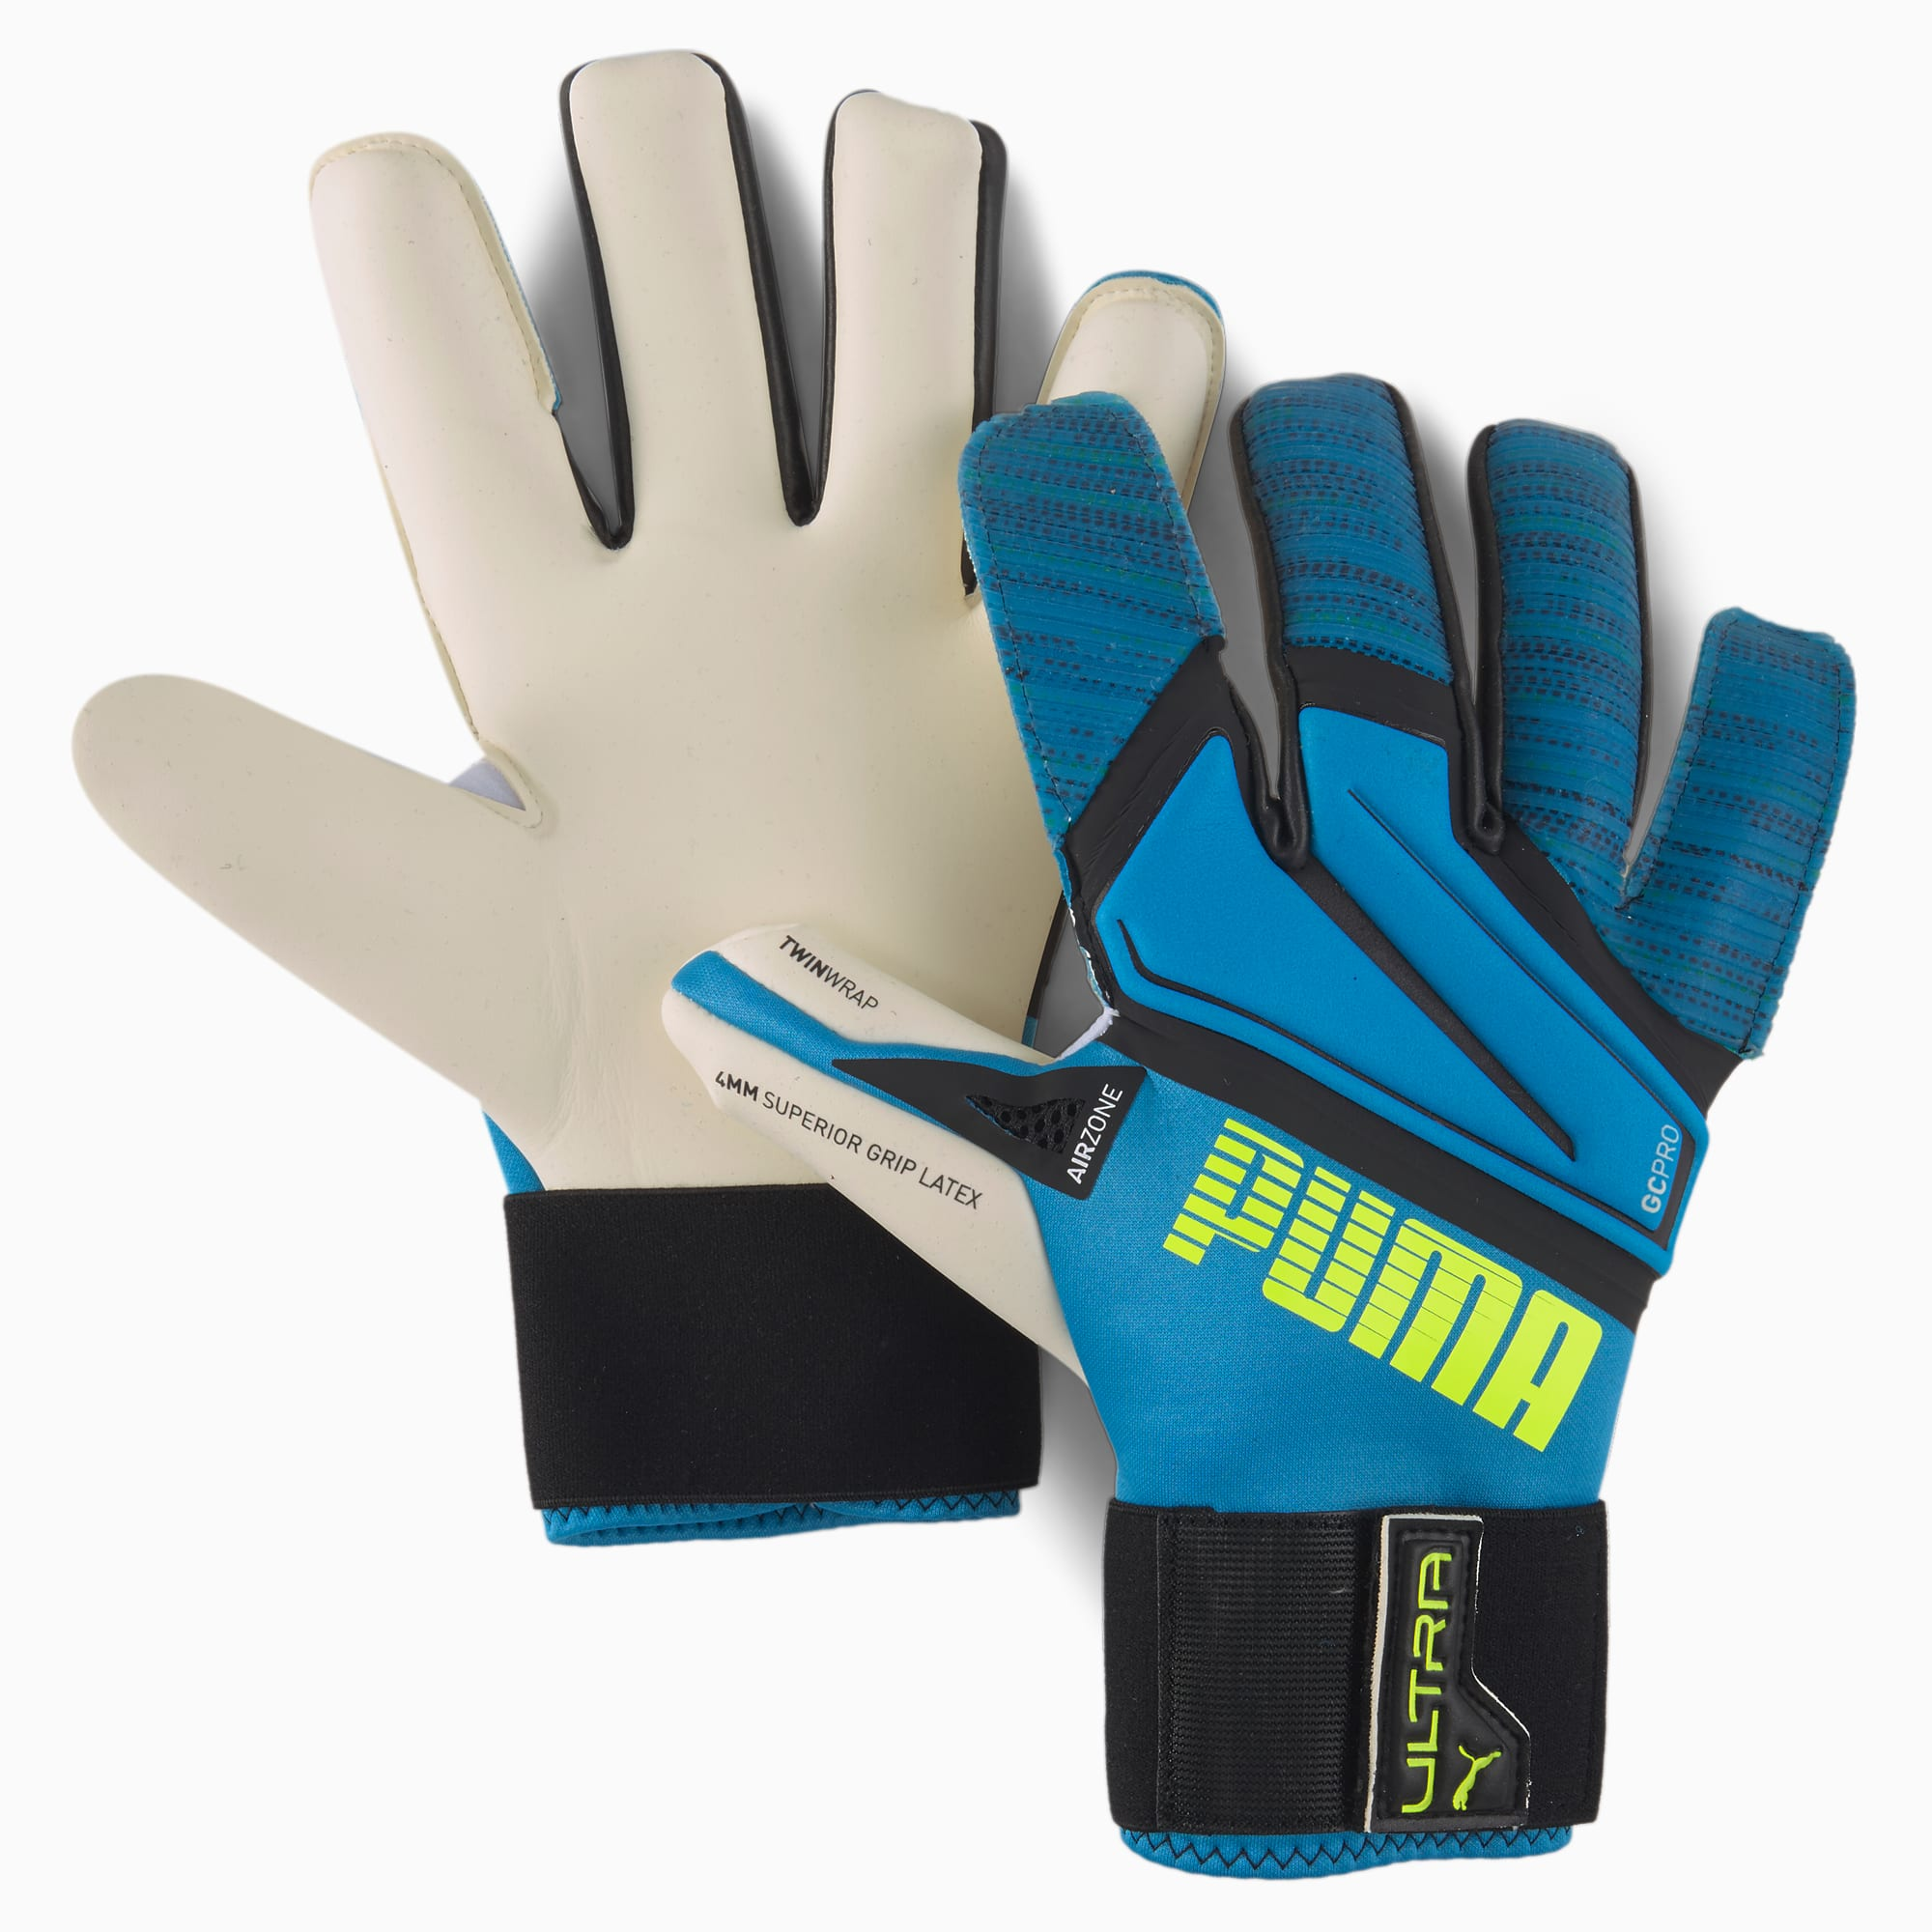 PUMA ULTRA Grip 1 Hybrid Pro Goalkeeper Gloves